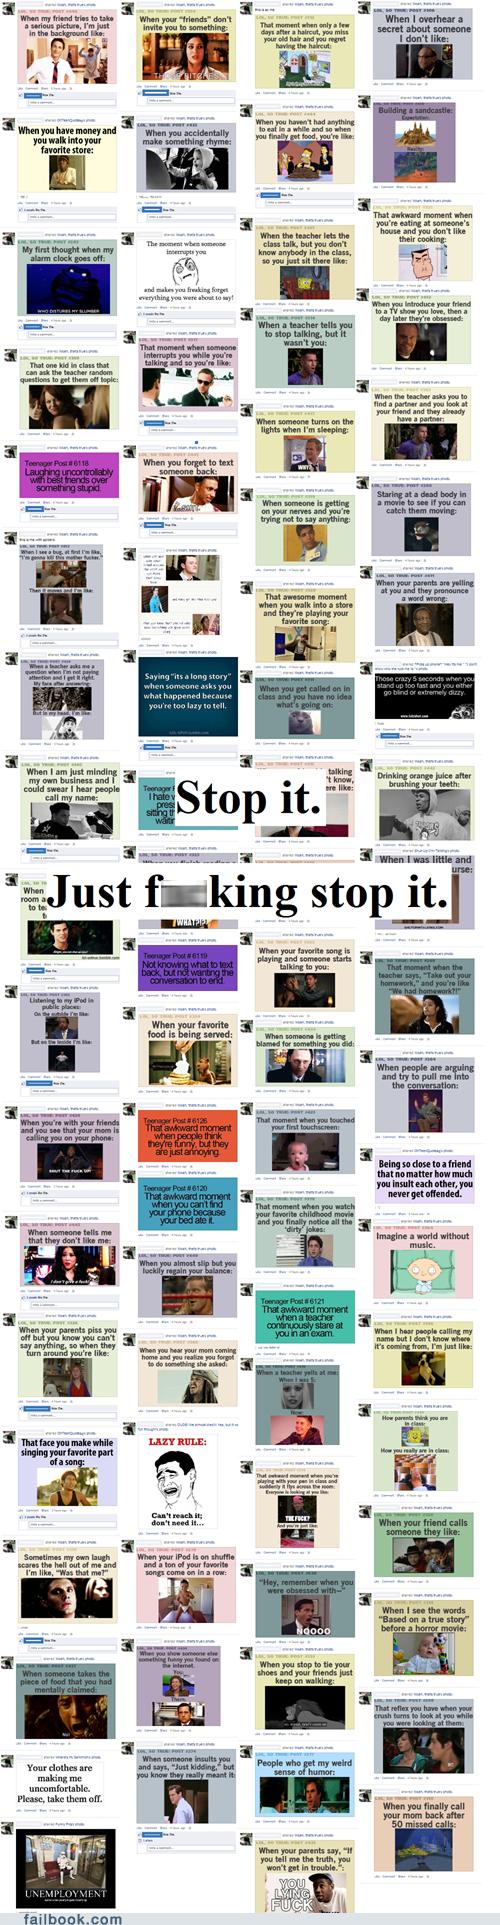 Oversharing,sharing,stop